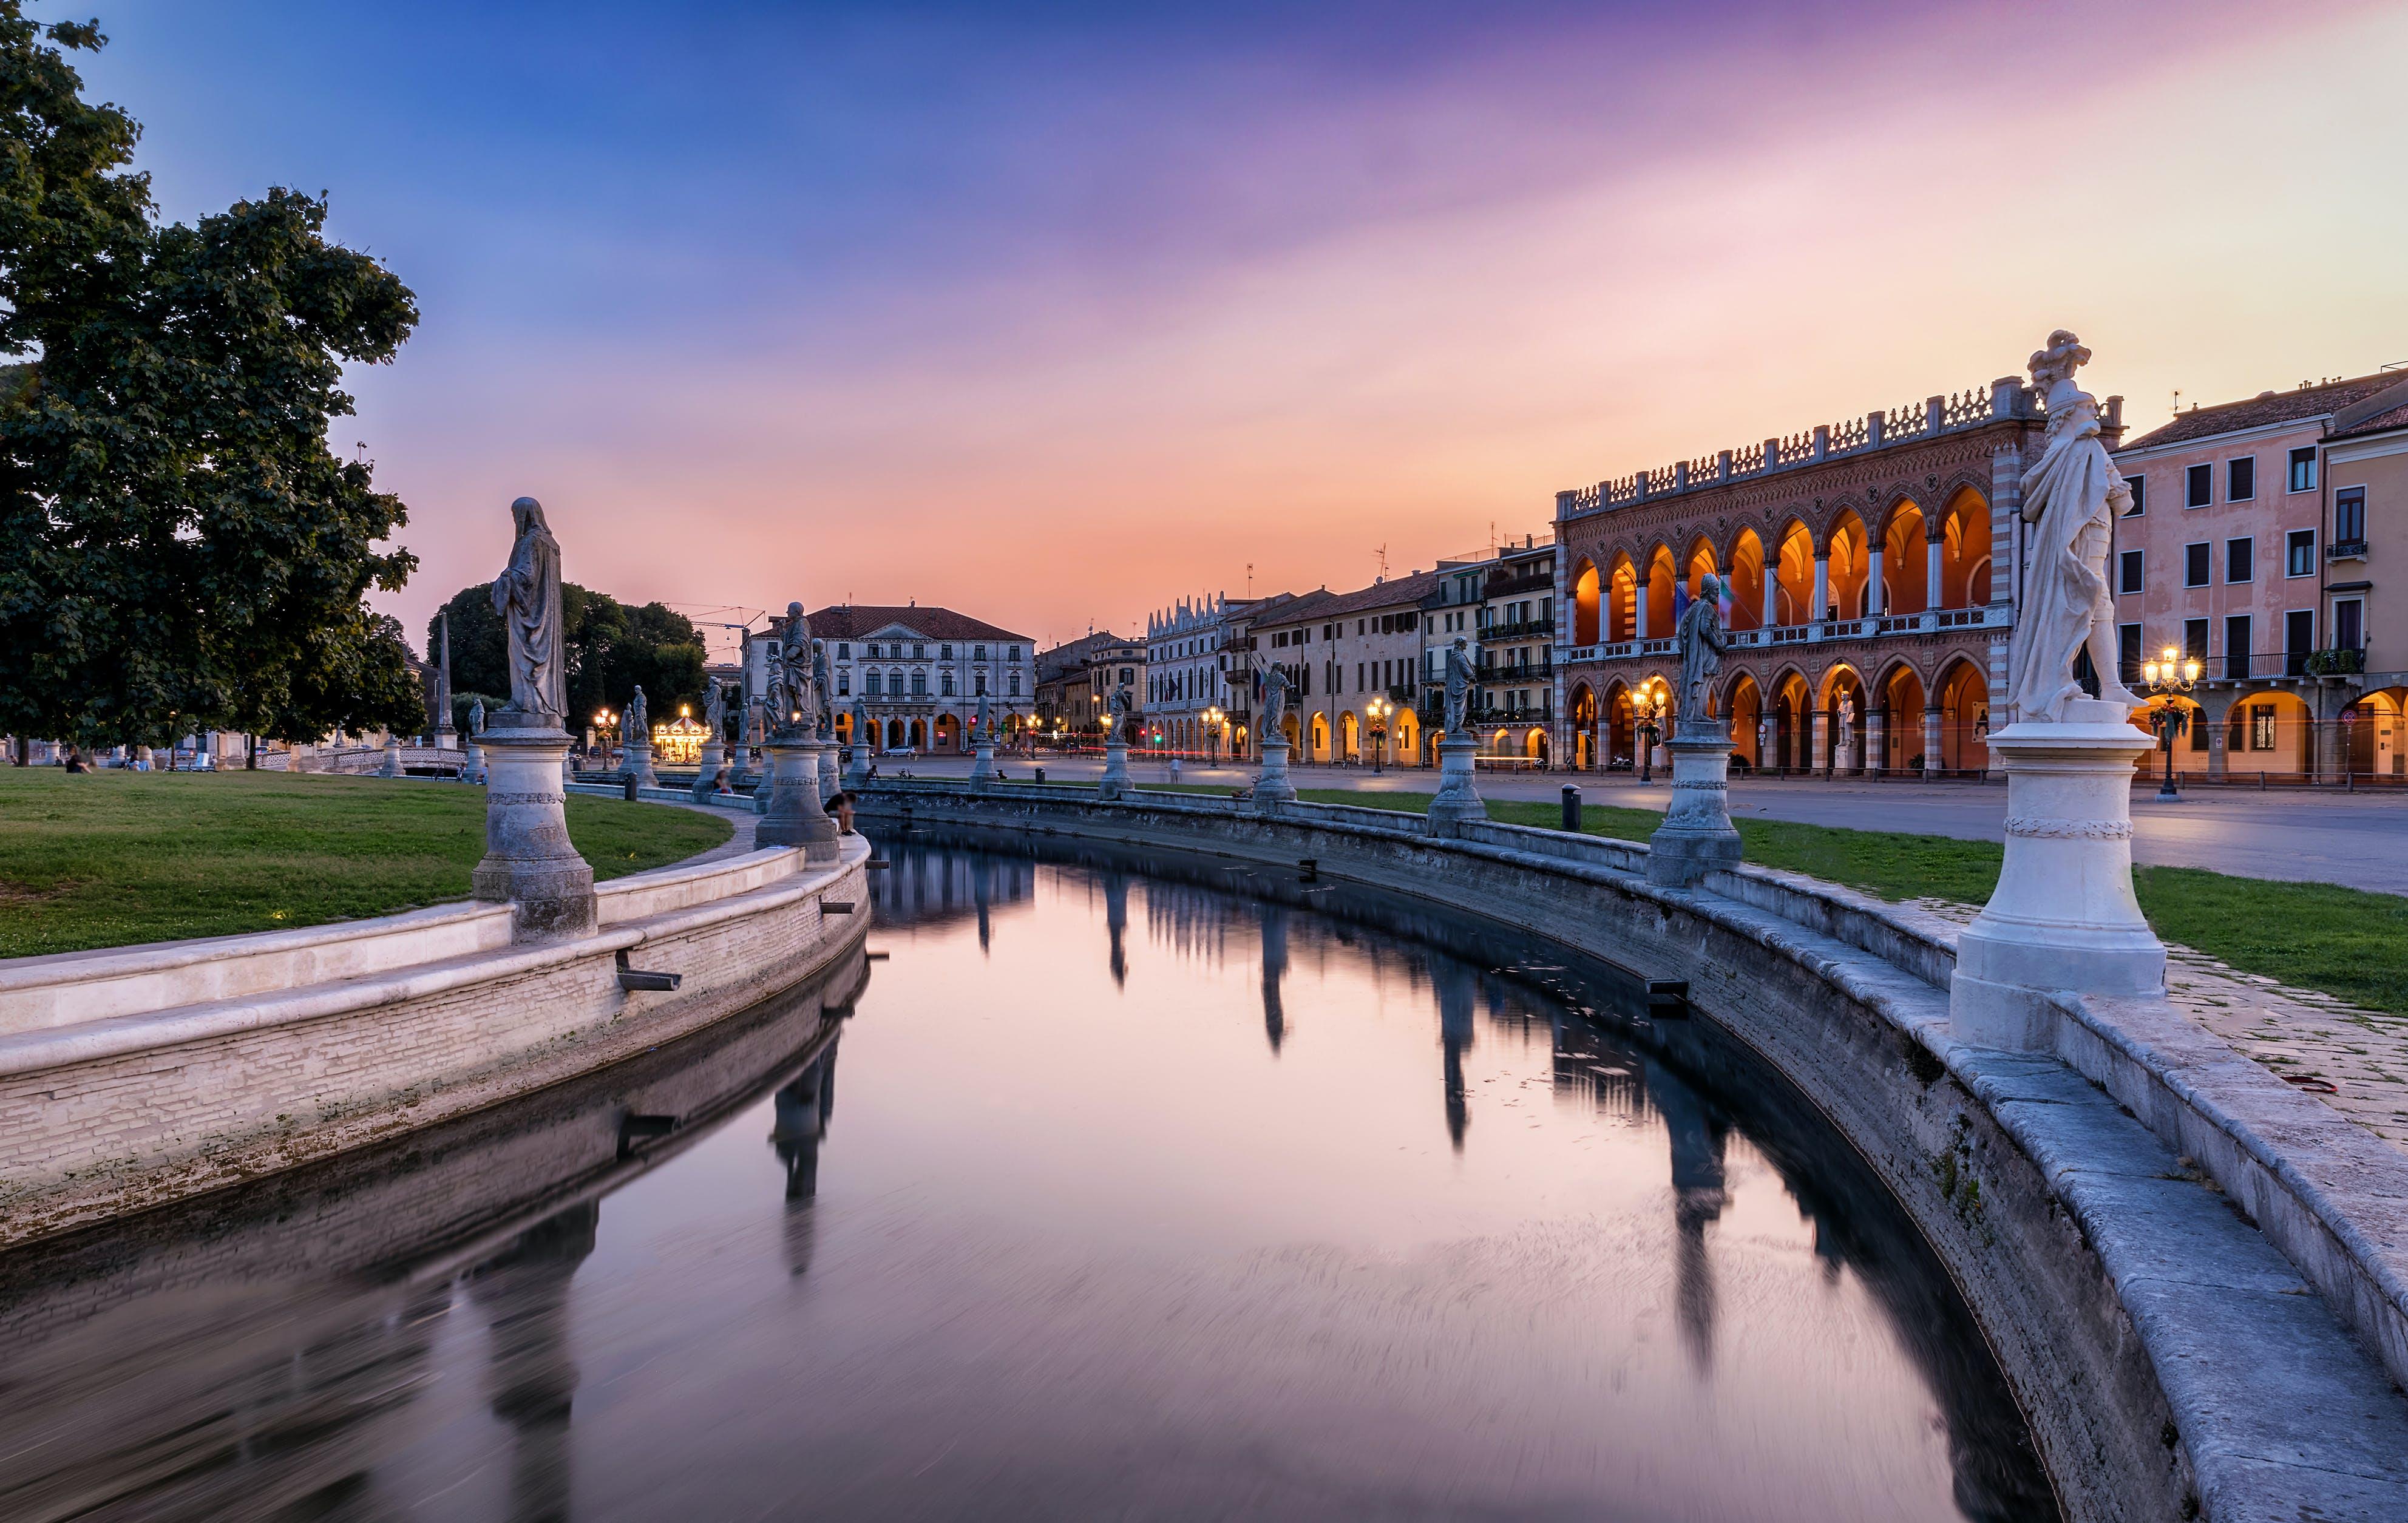 Het beroemde plein Prato della Valle in Padua